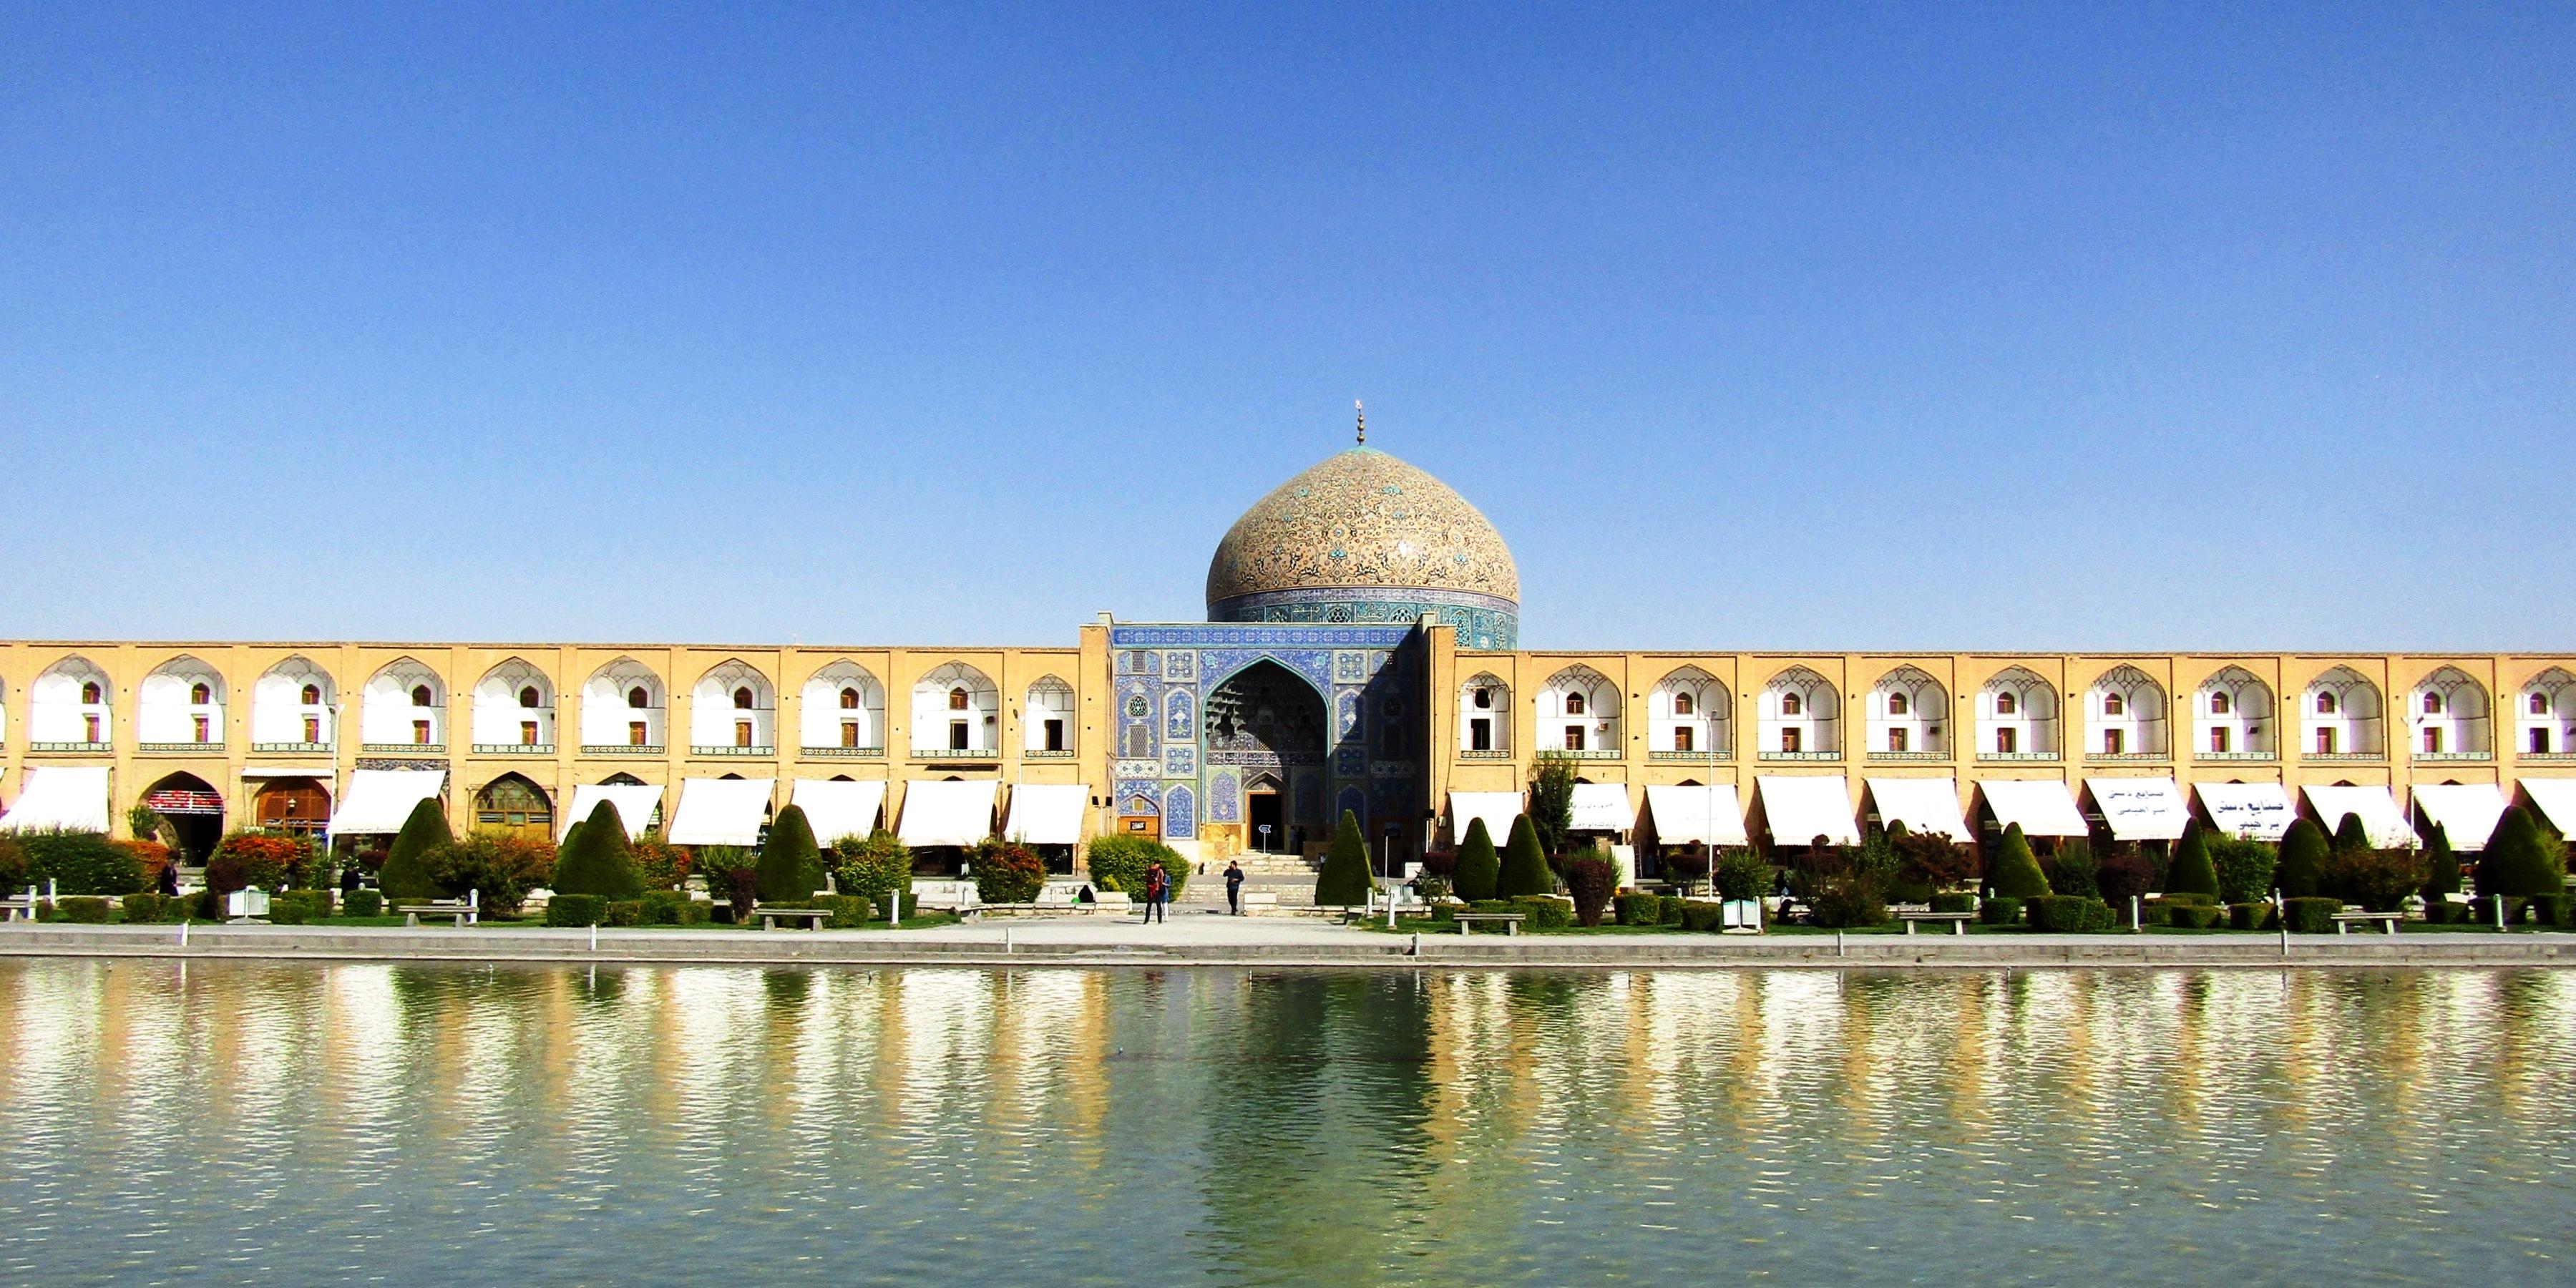 Naqsh-e Jahan Square and Sheikh Lotfollah Mosque